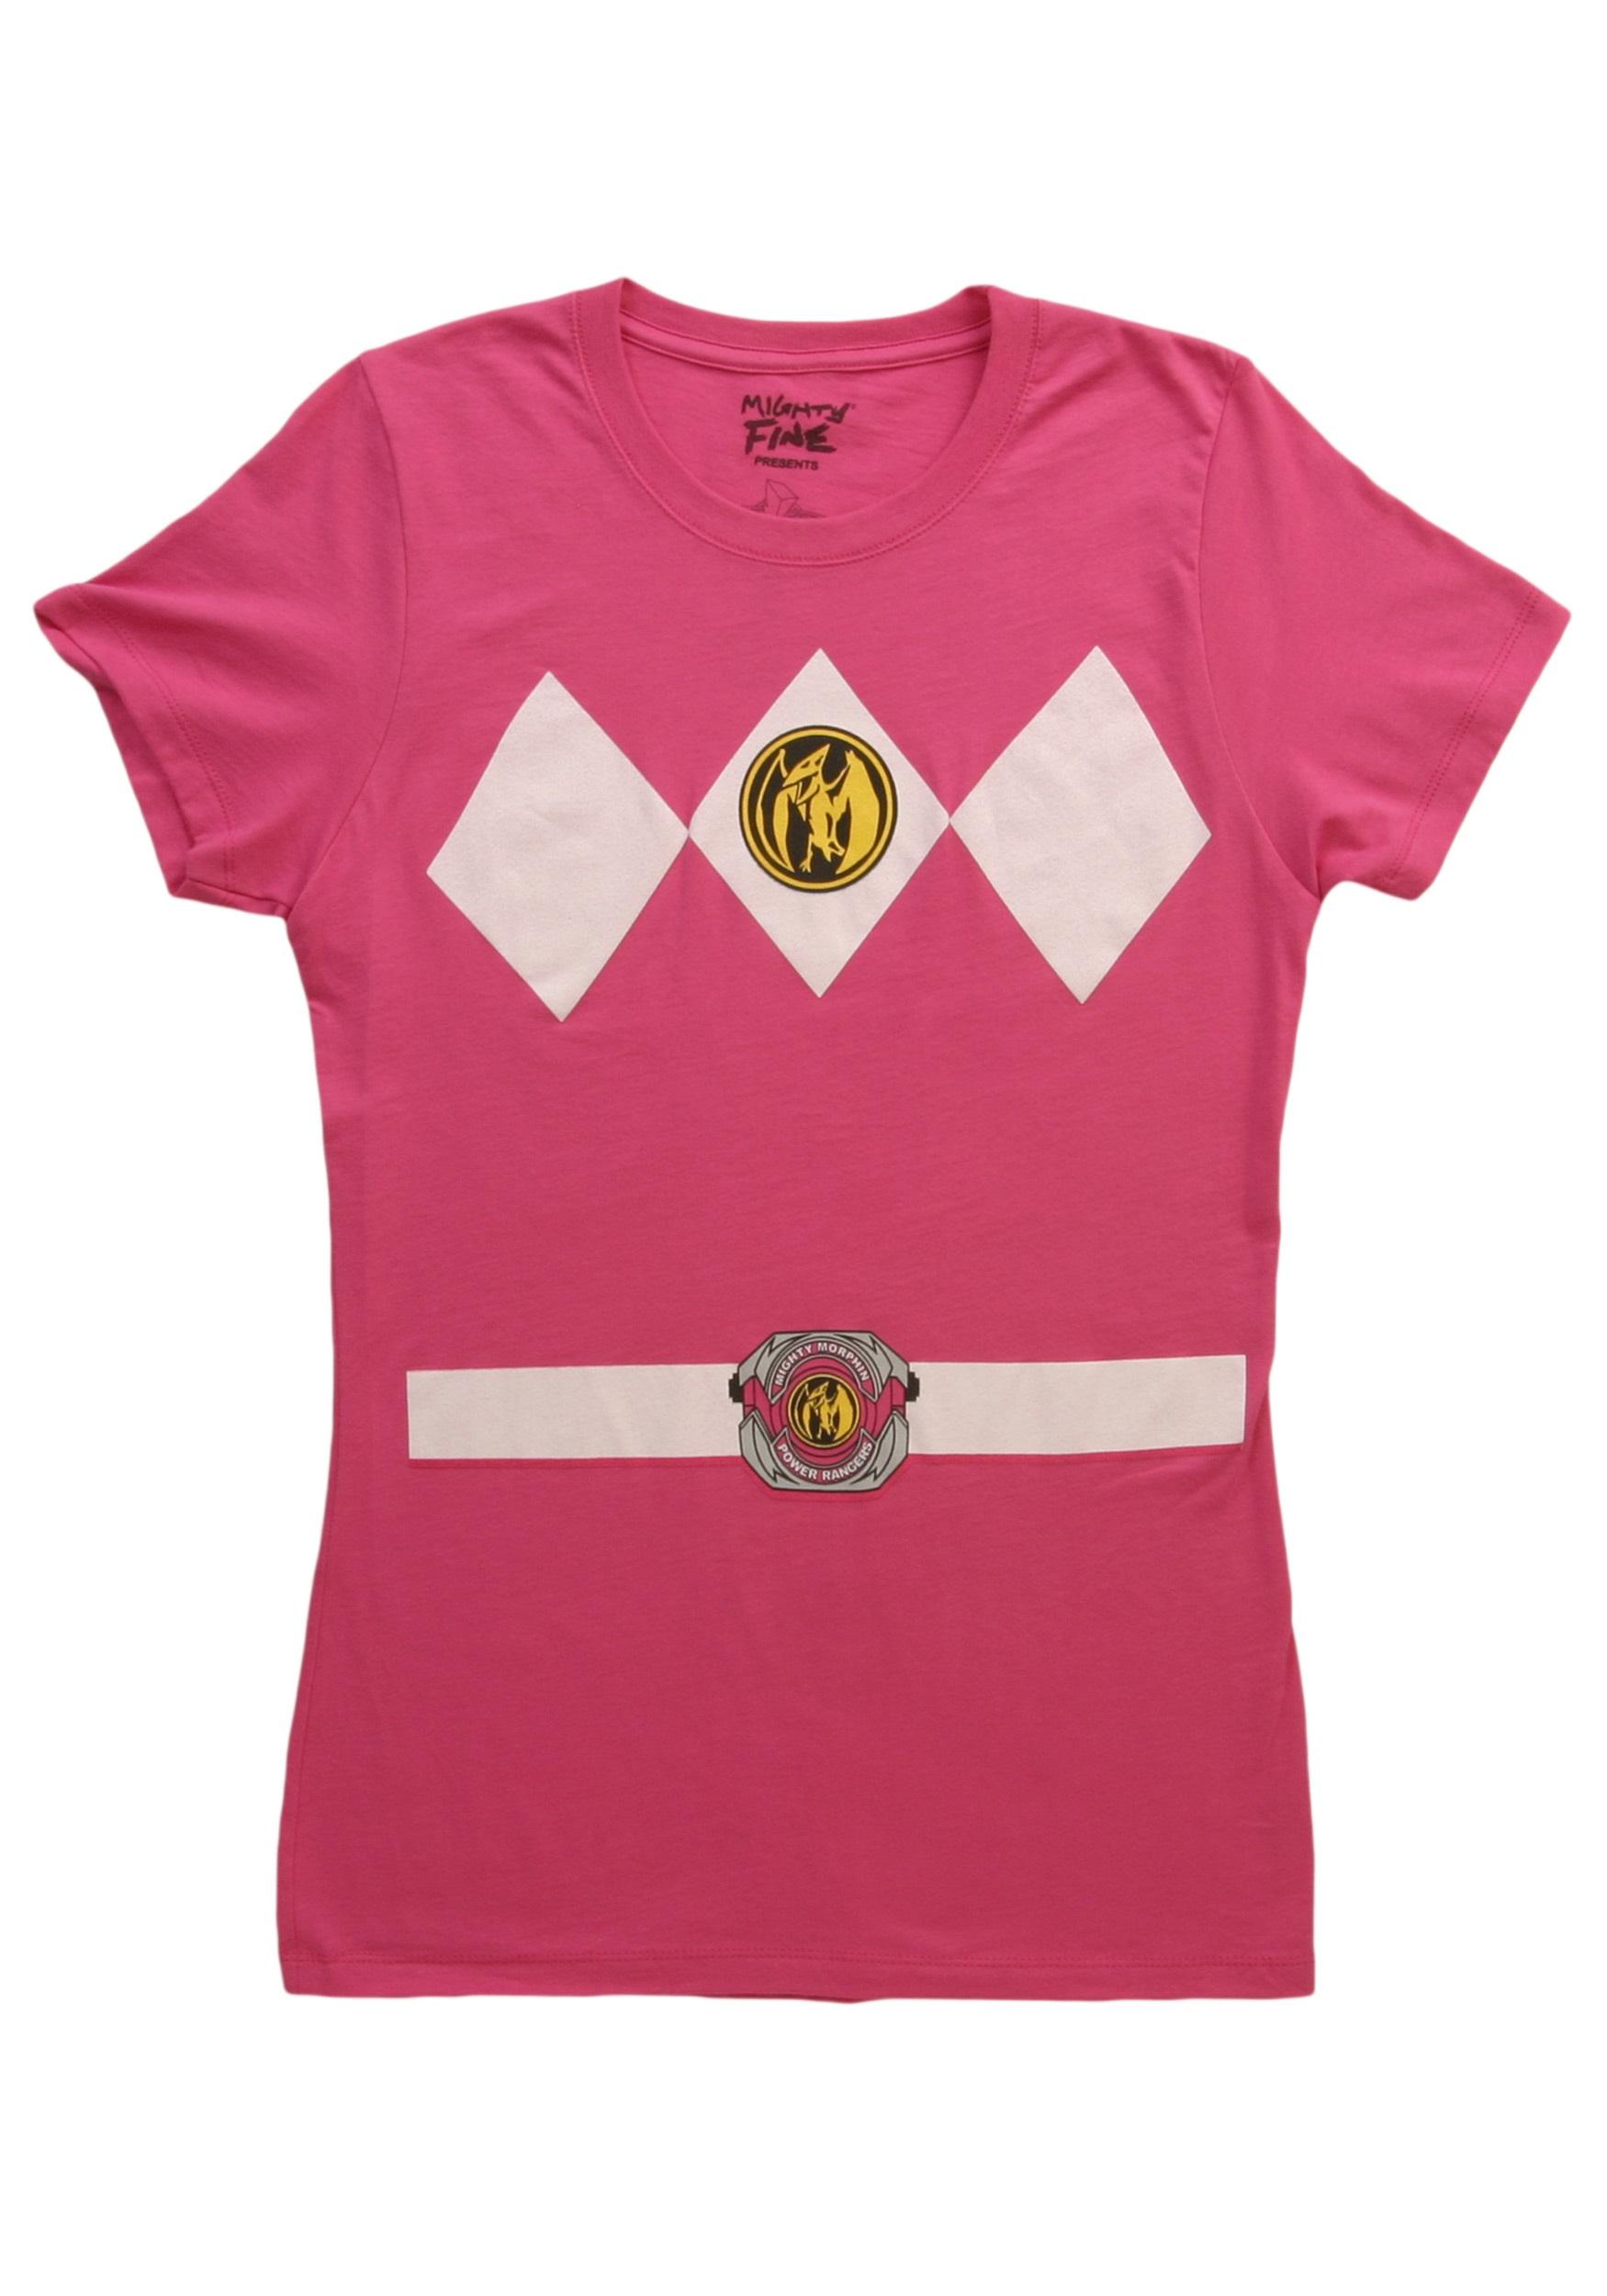 womens pink power ranger costume t shirt. Black Bedroom Furniture Sets. Home Design Ideas